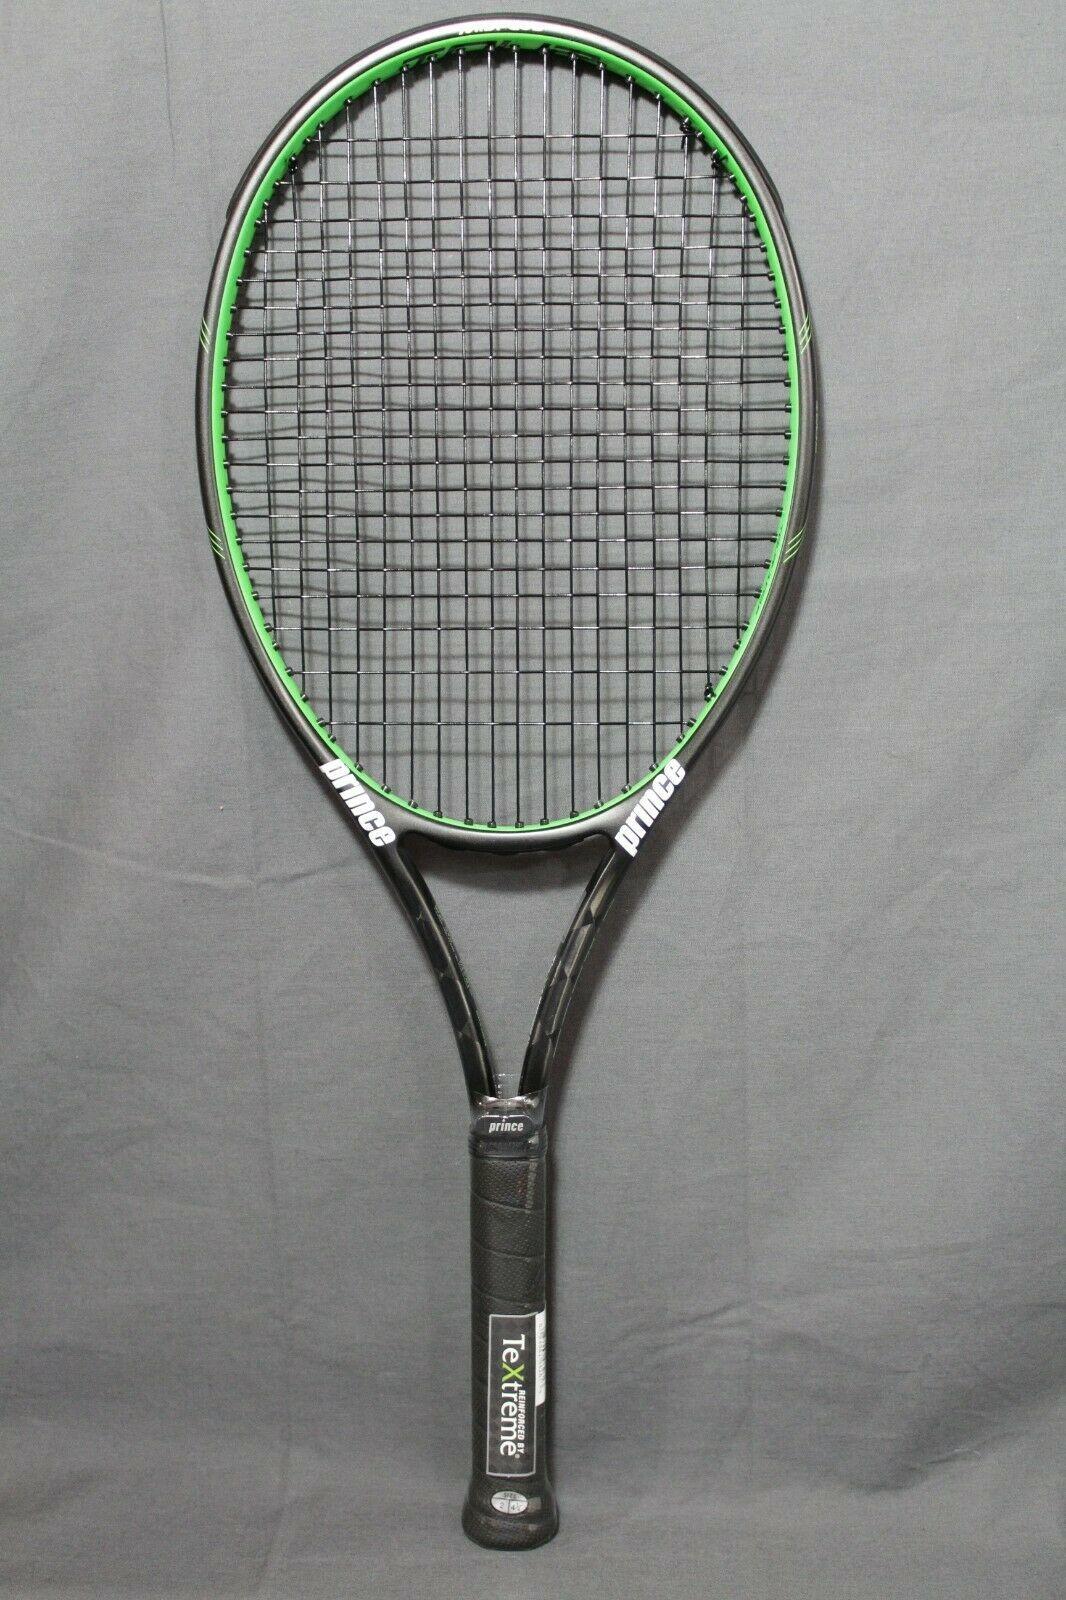 NEW Prince Textreme Tour 100P 2015 Tennis Racquet 4 1/4  Strung